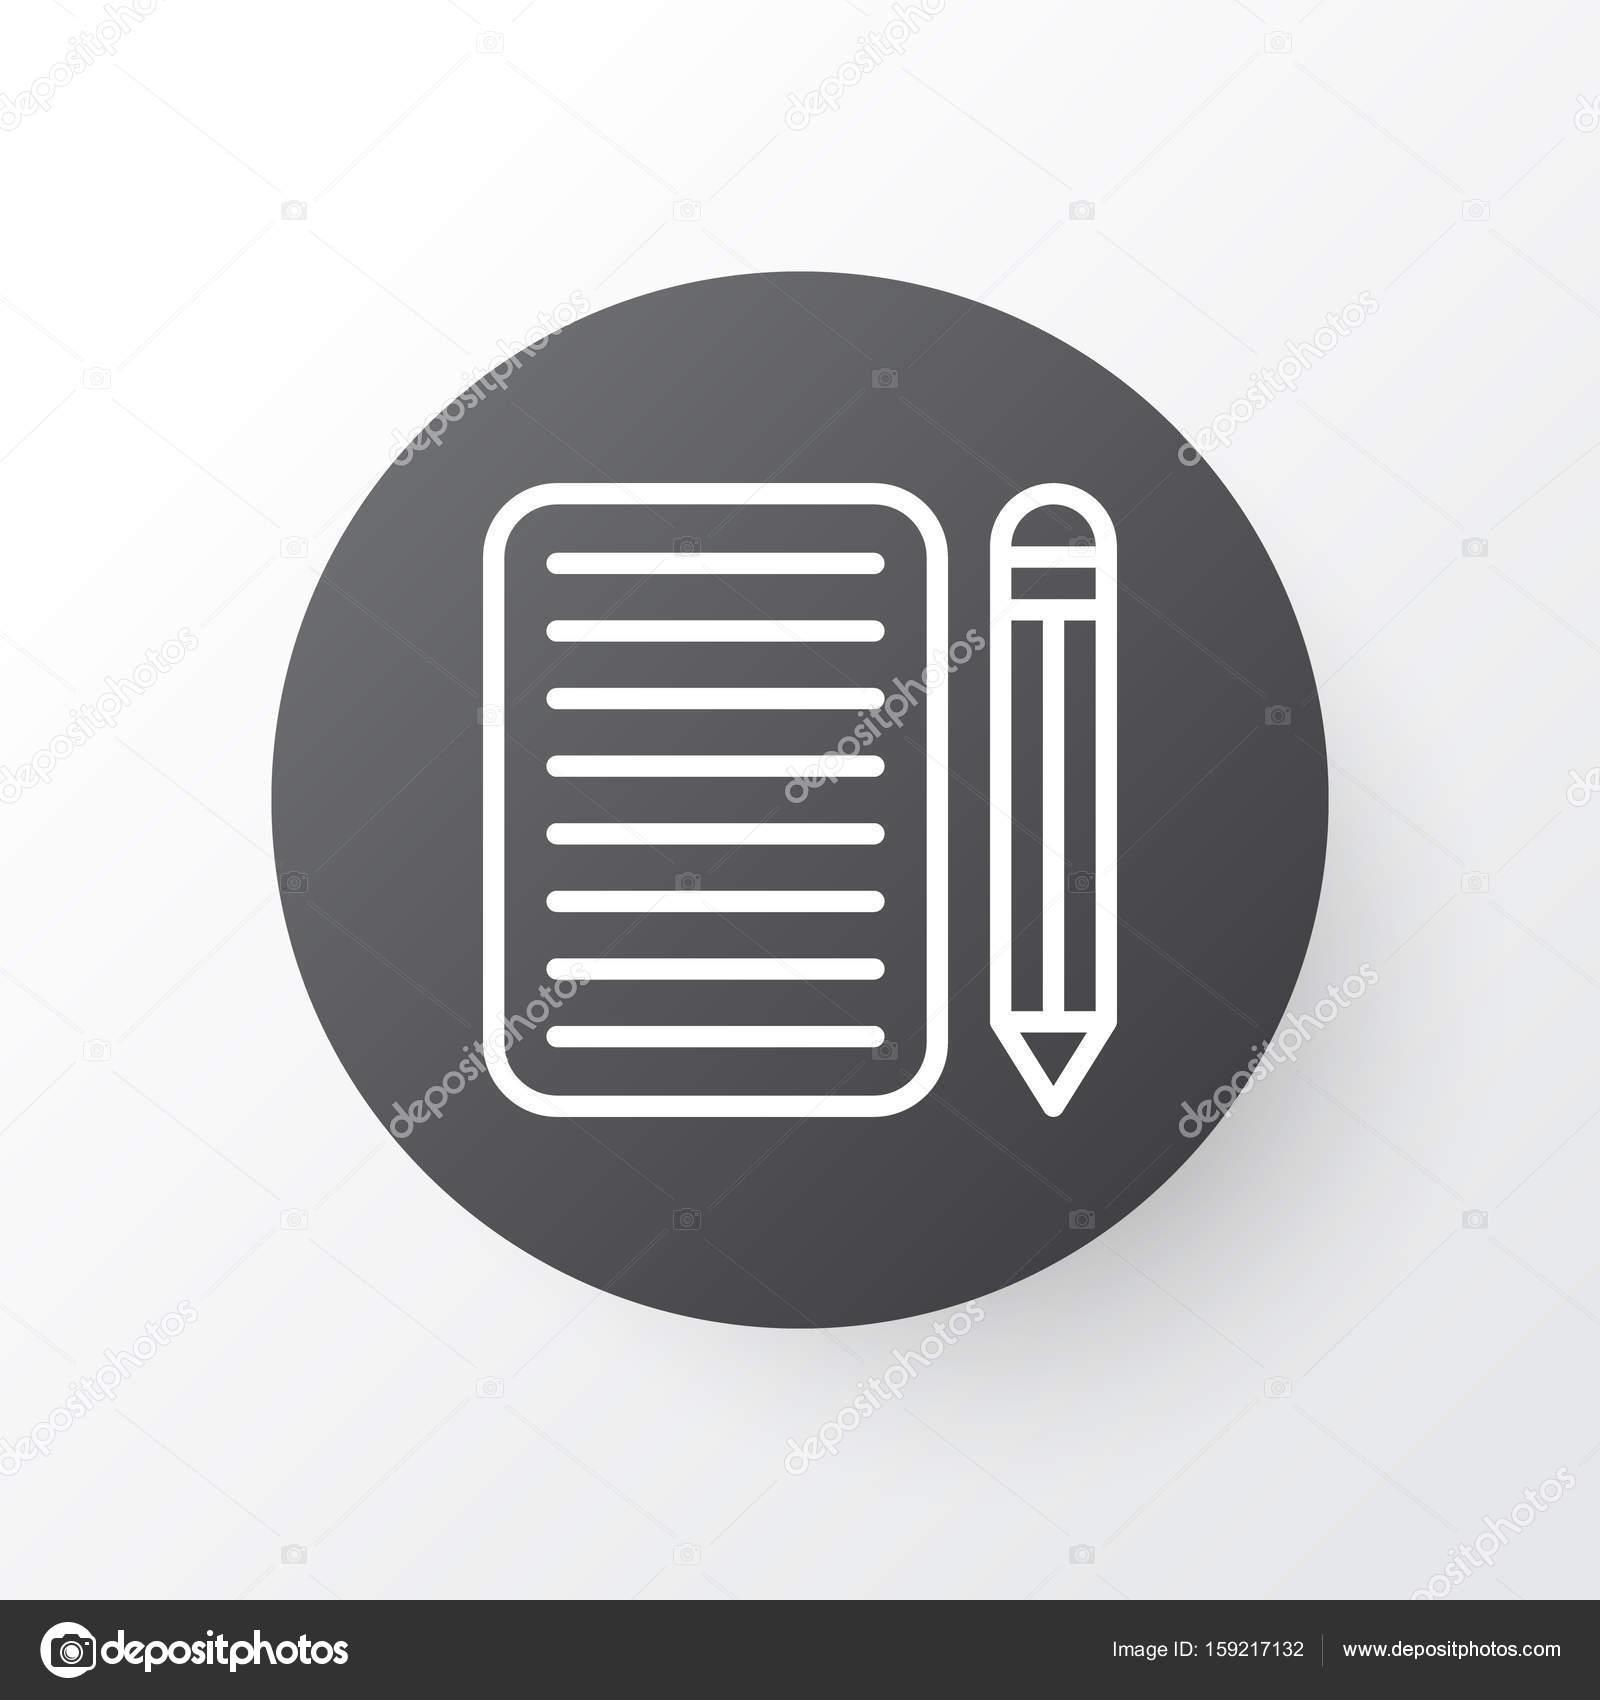 quality essay writing